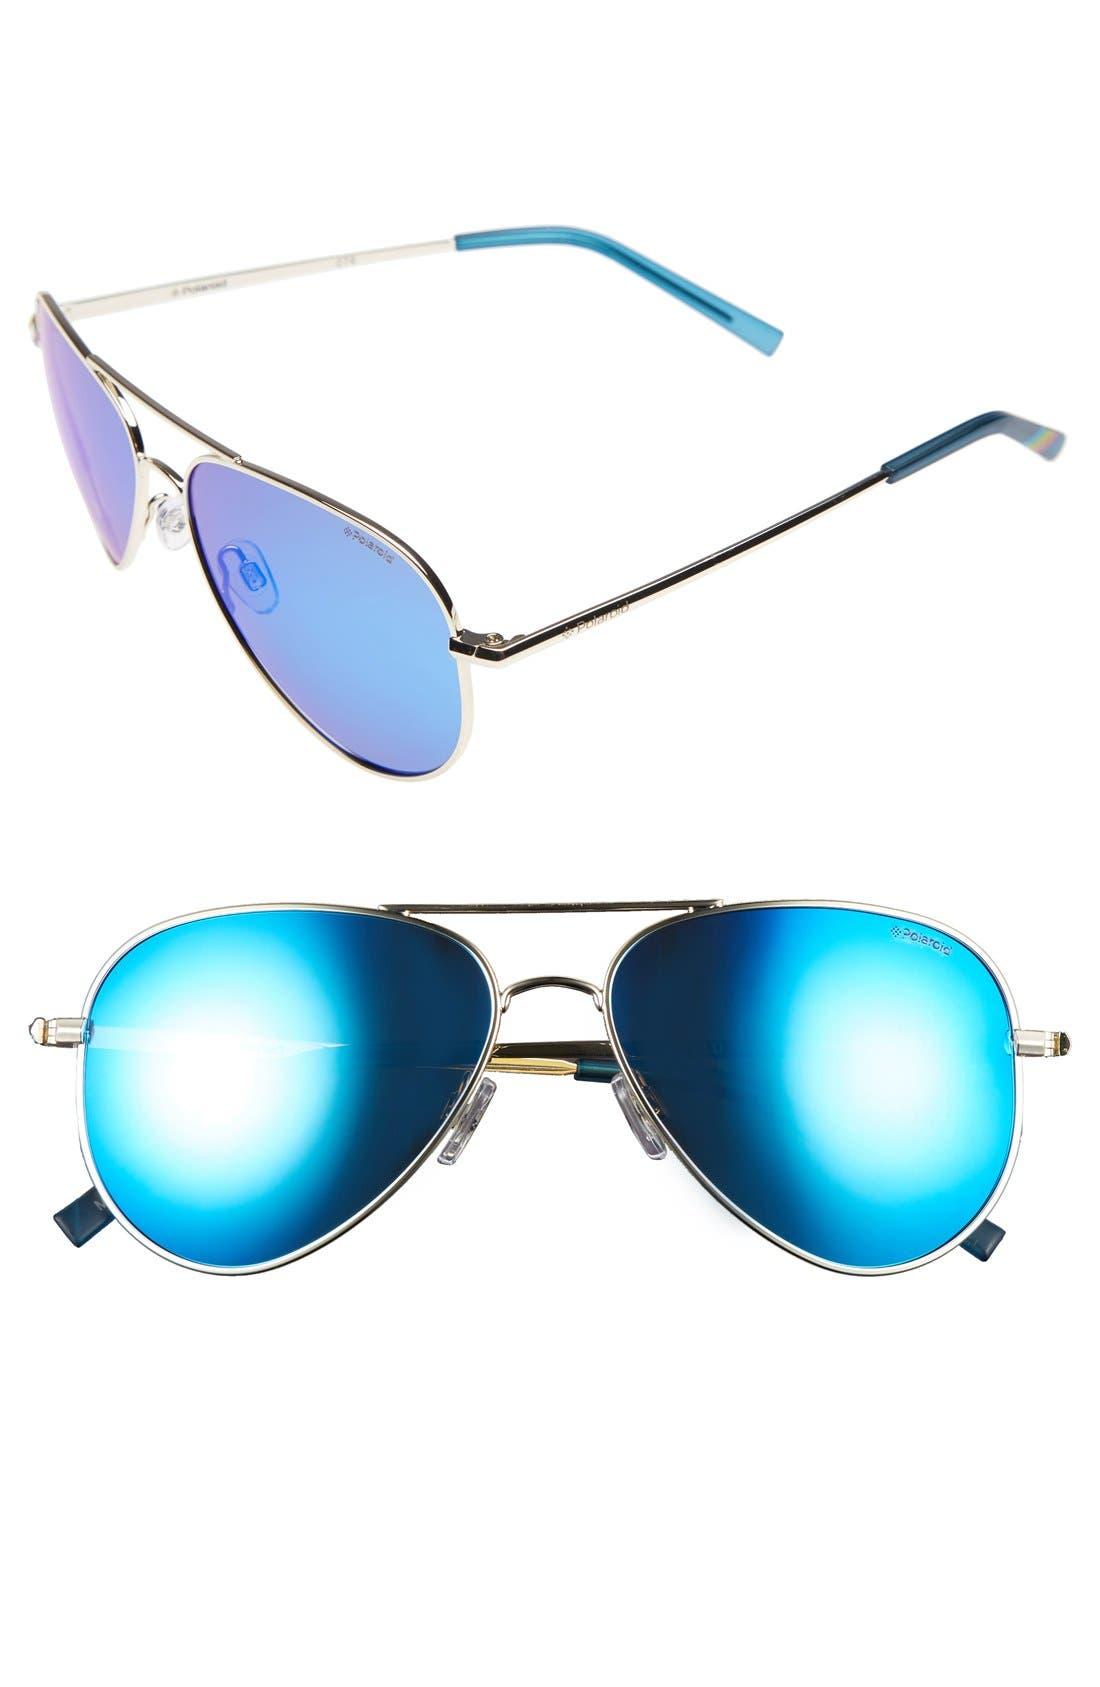 Main Image - Polaroid 6012/N 56mm Polarized Aviator Sunglasses